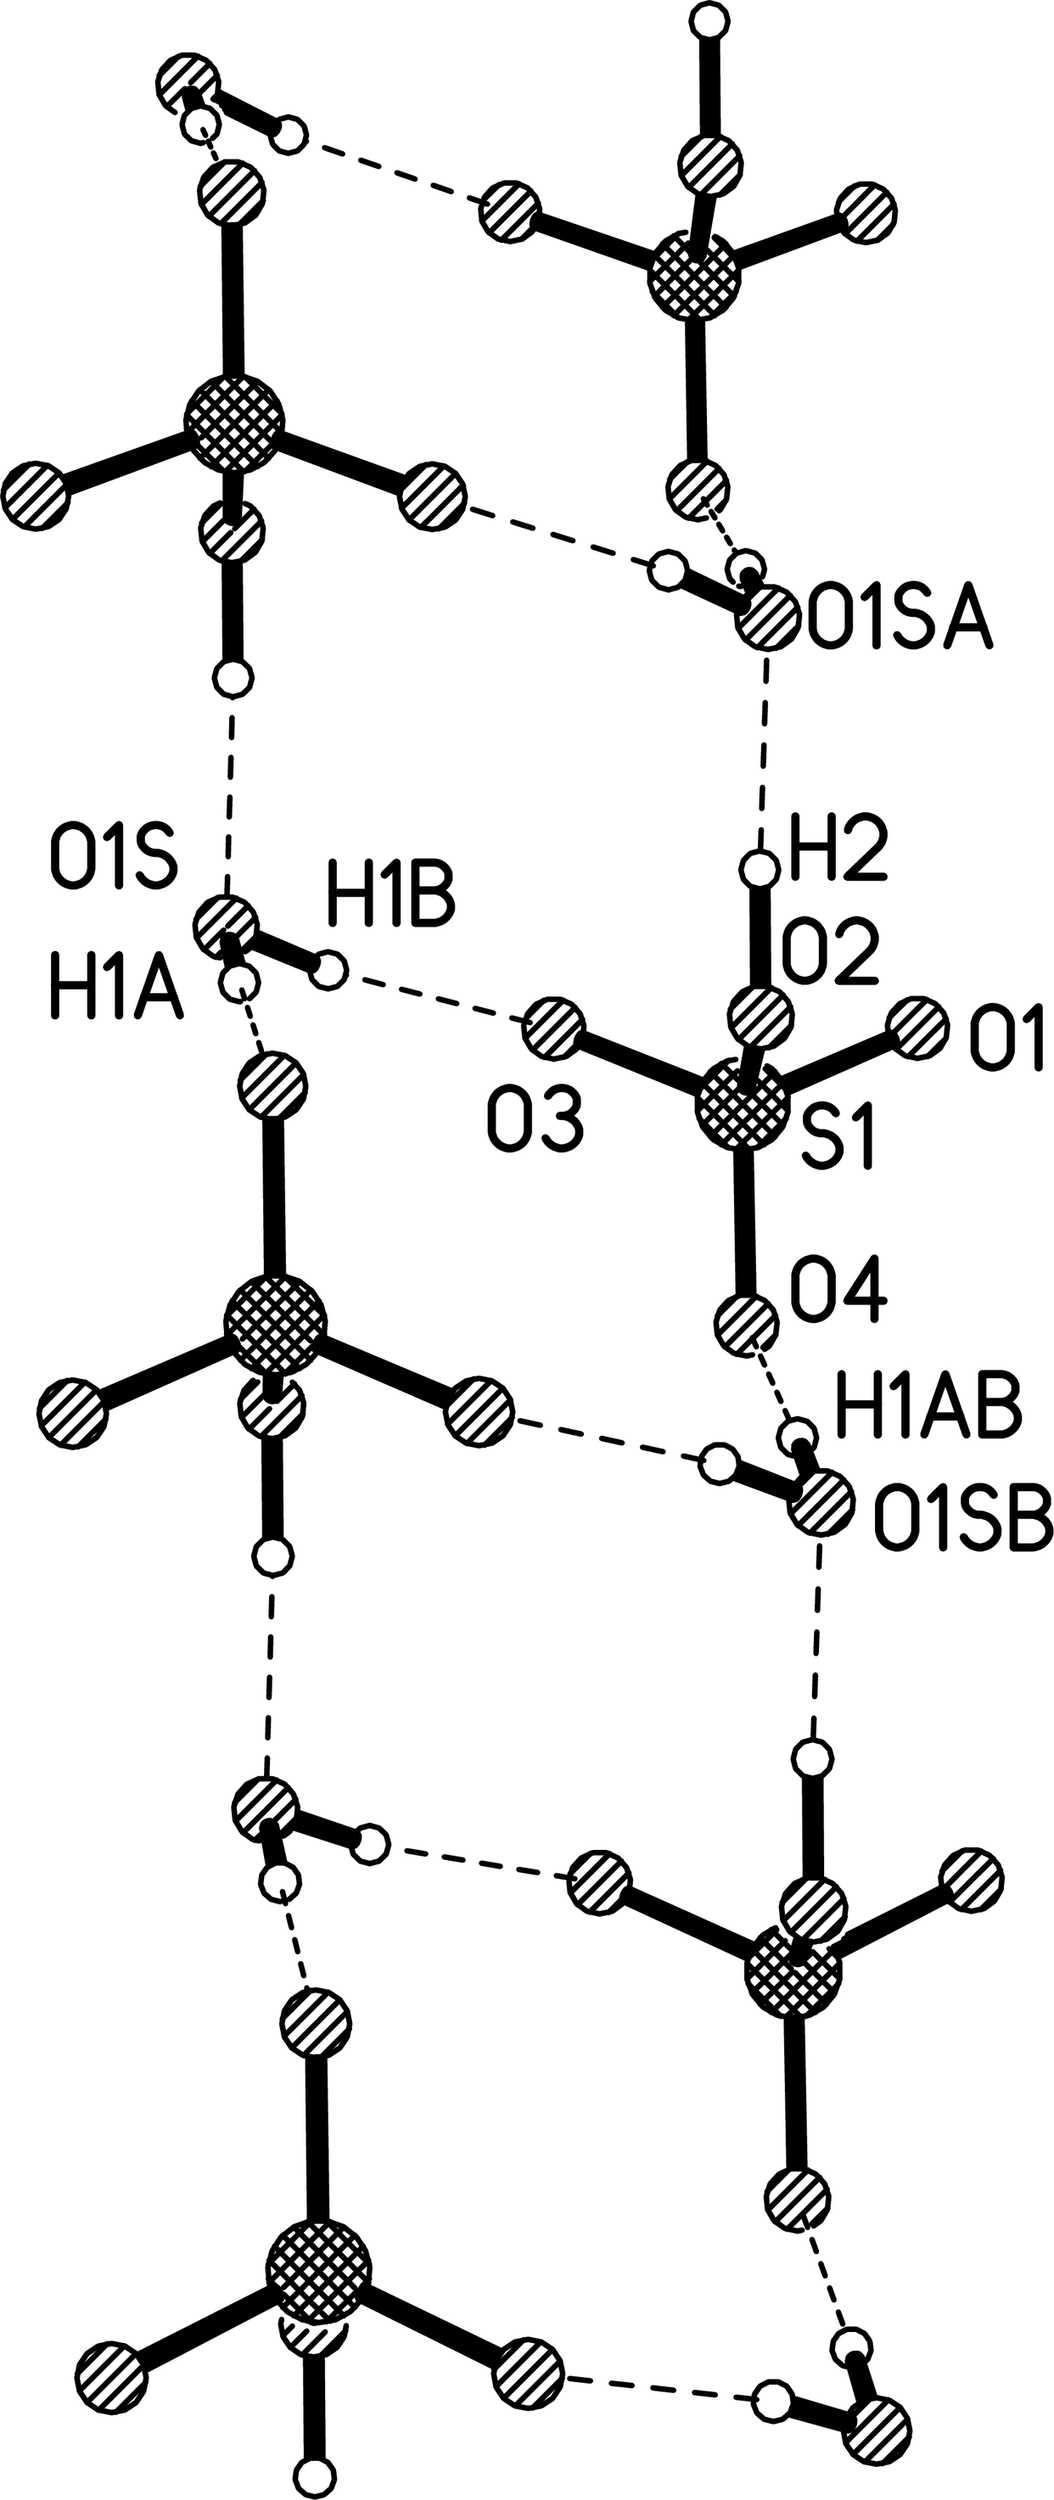 Iucr Phenazin 5 Ium Hydrogen Sulfate Monohydrate